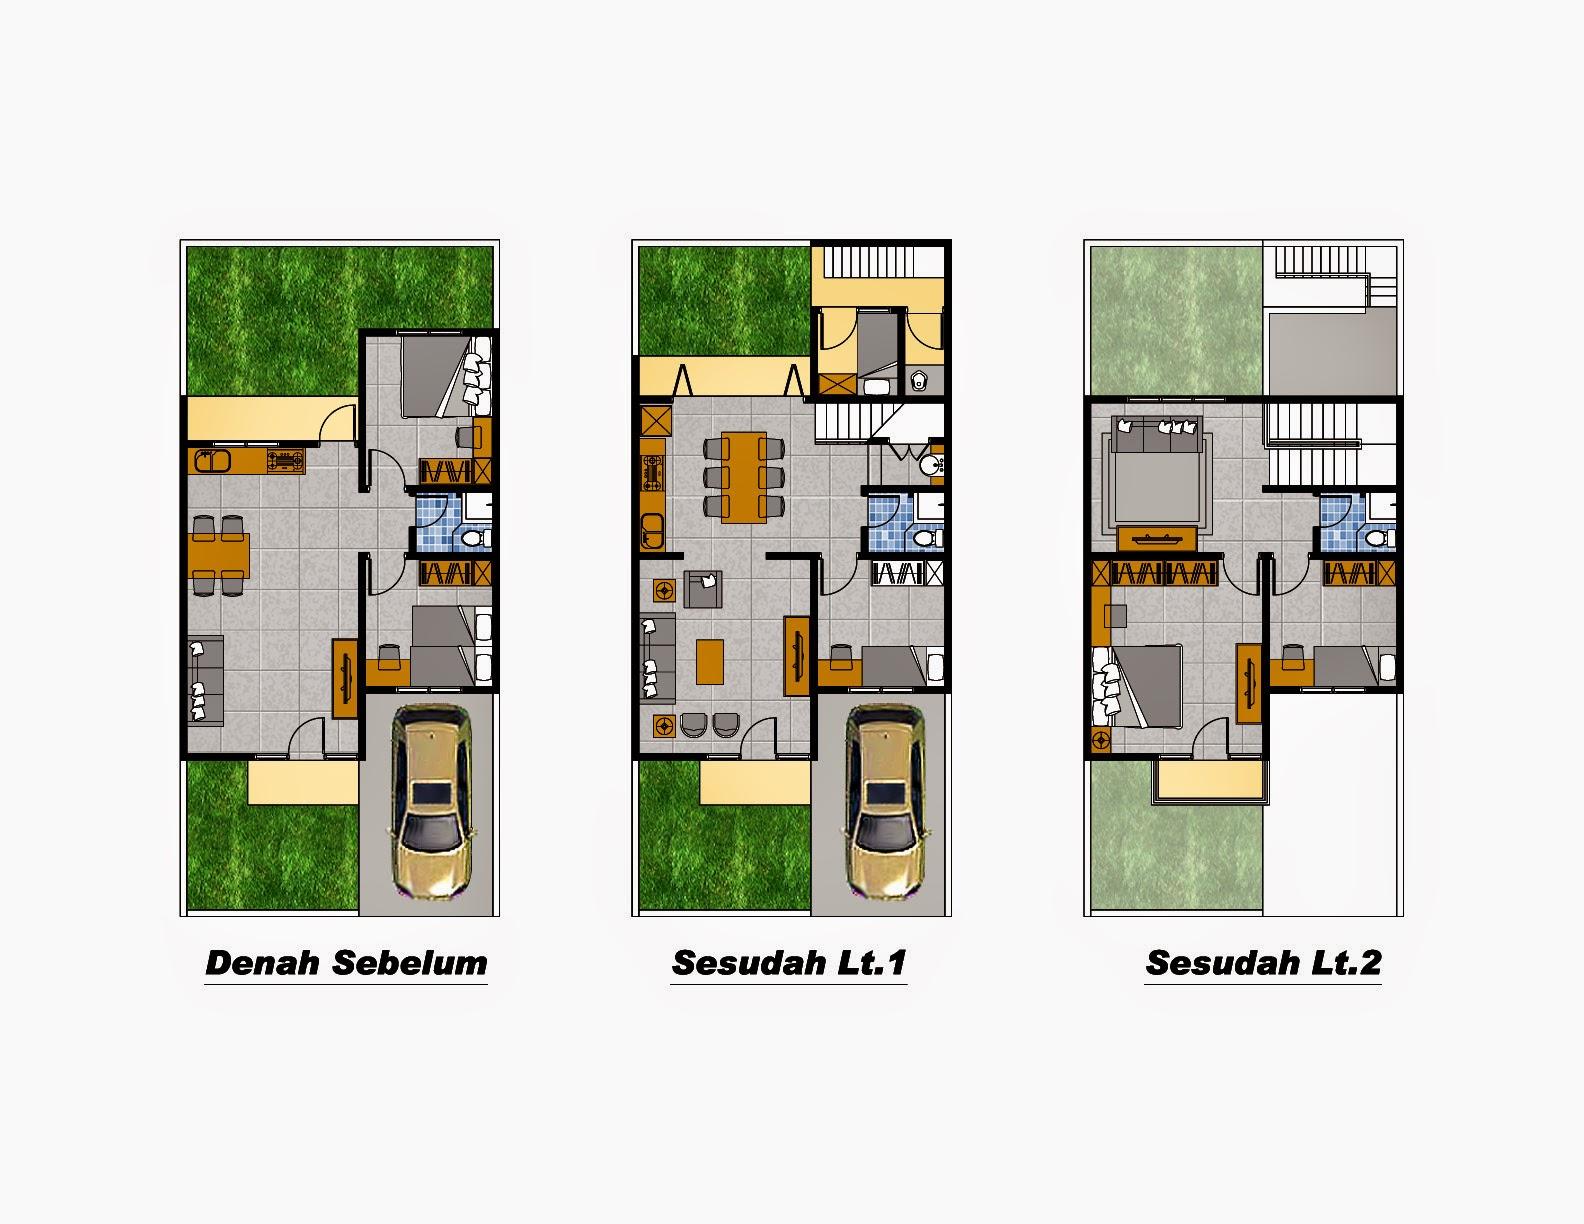 desain interior rumah minimalis type 45 | desain interior rumah